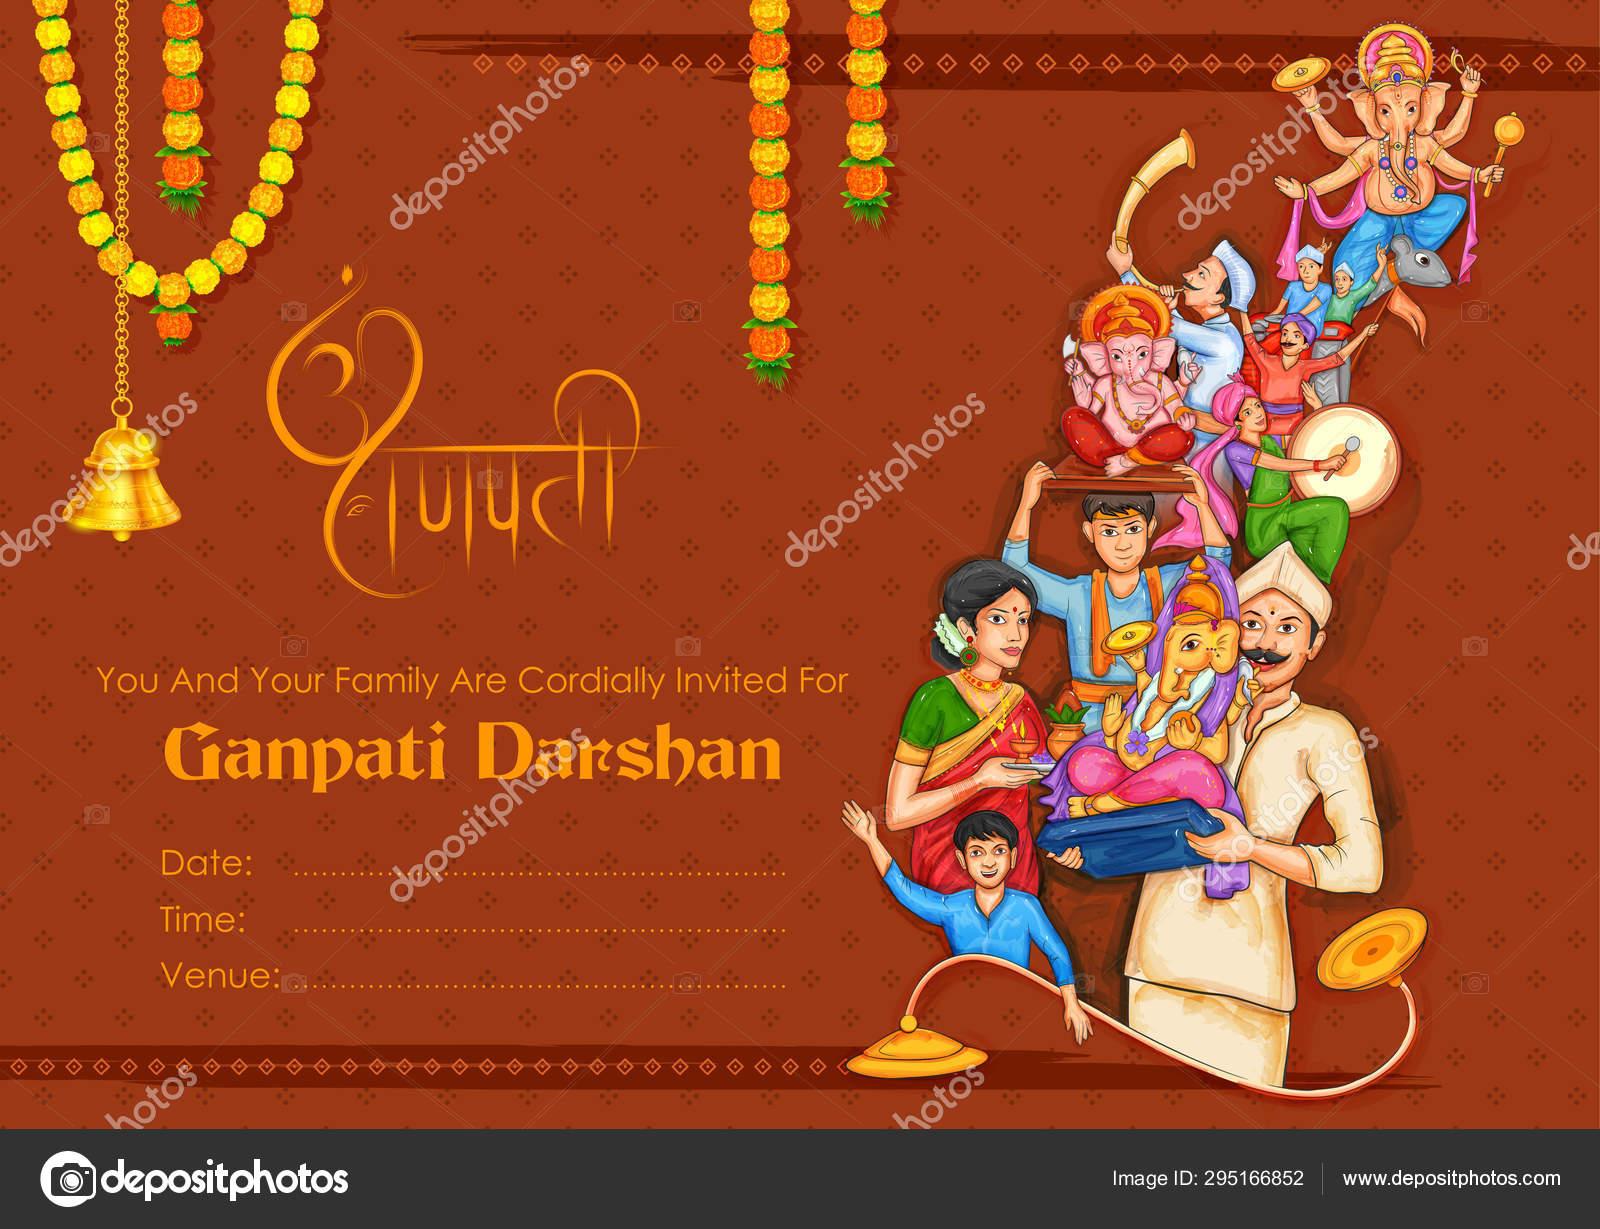 Indian People Celebrating Lord Ganpati Background For Ganesh